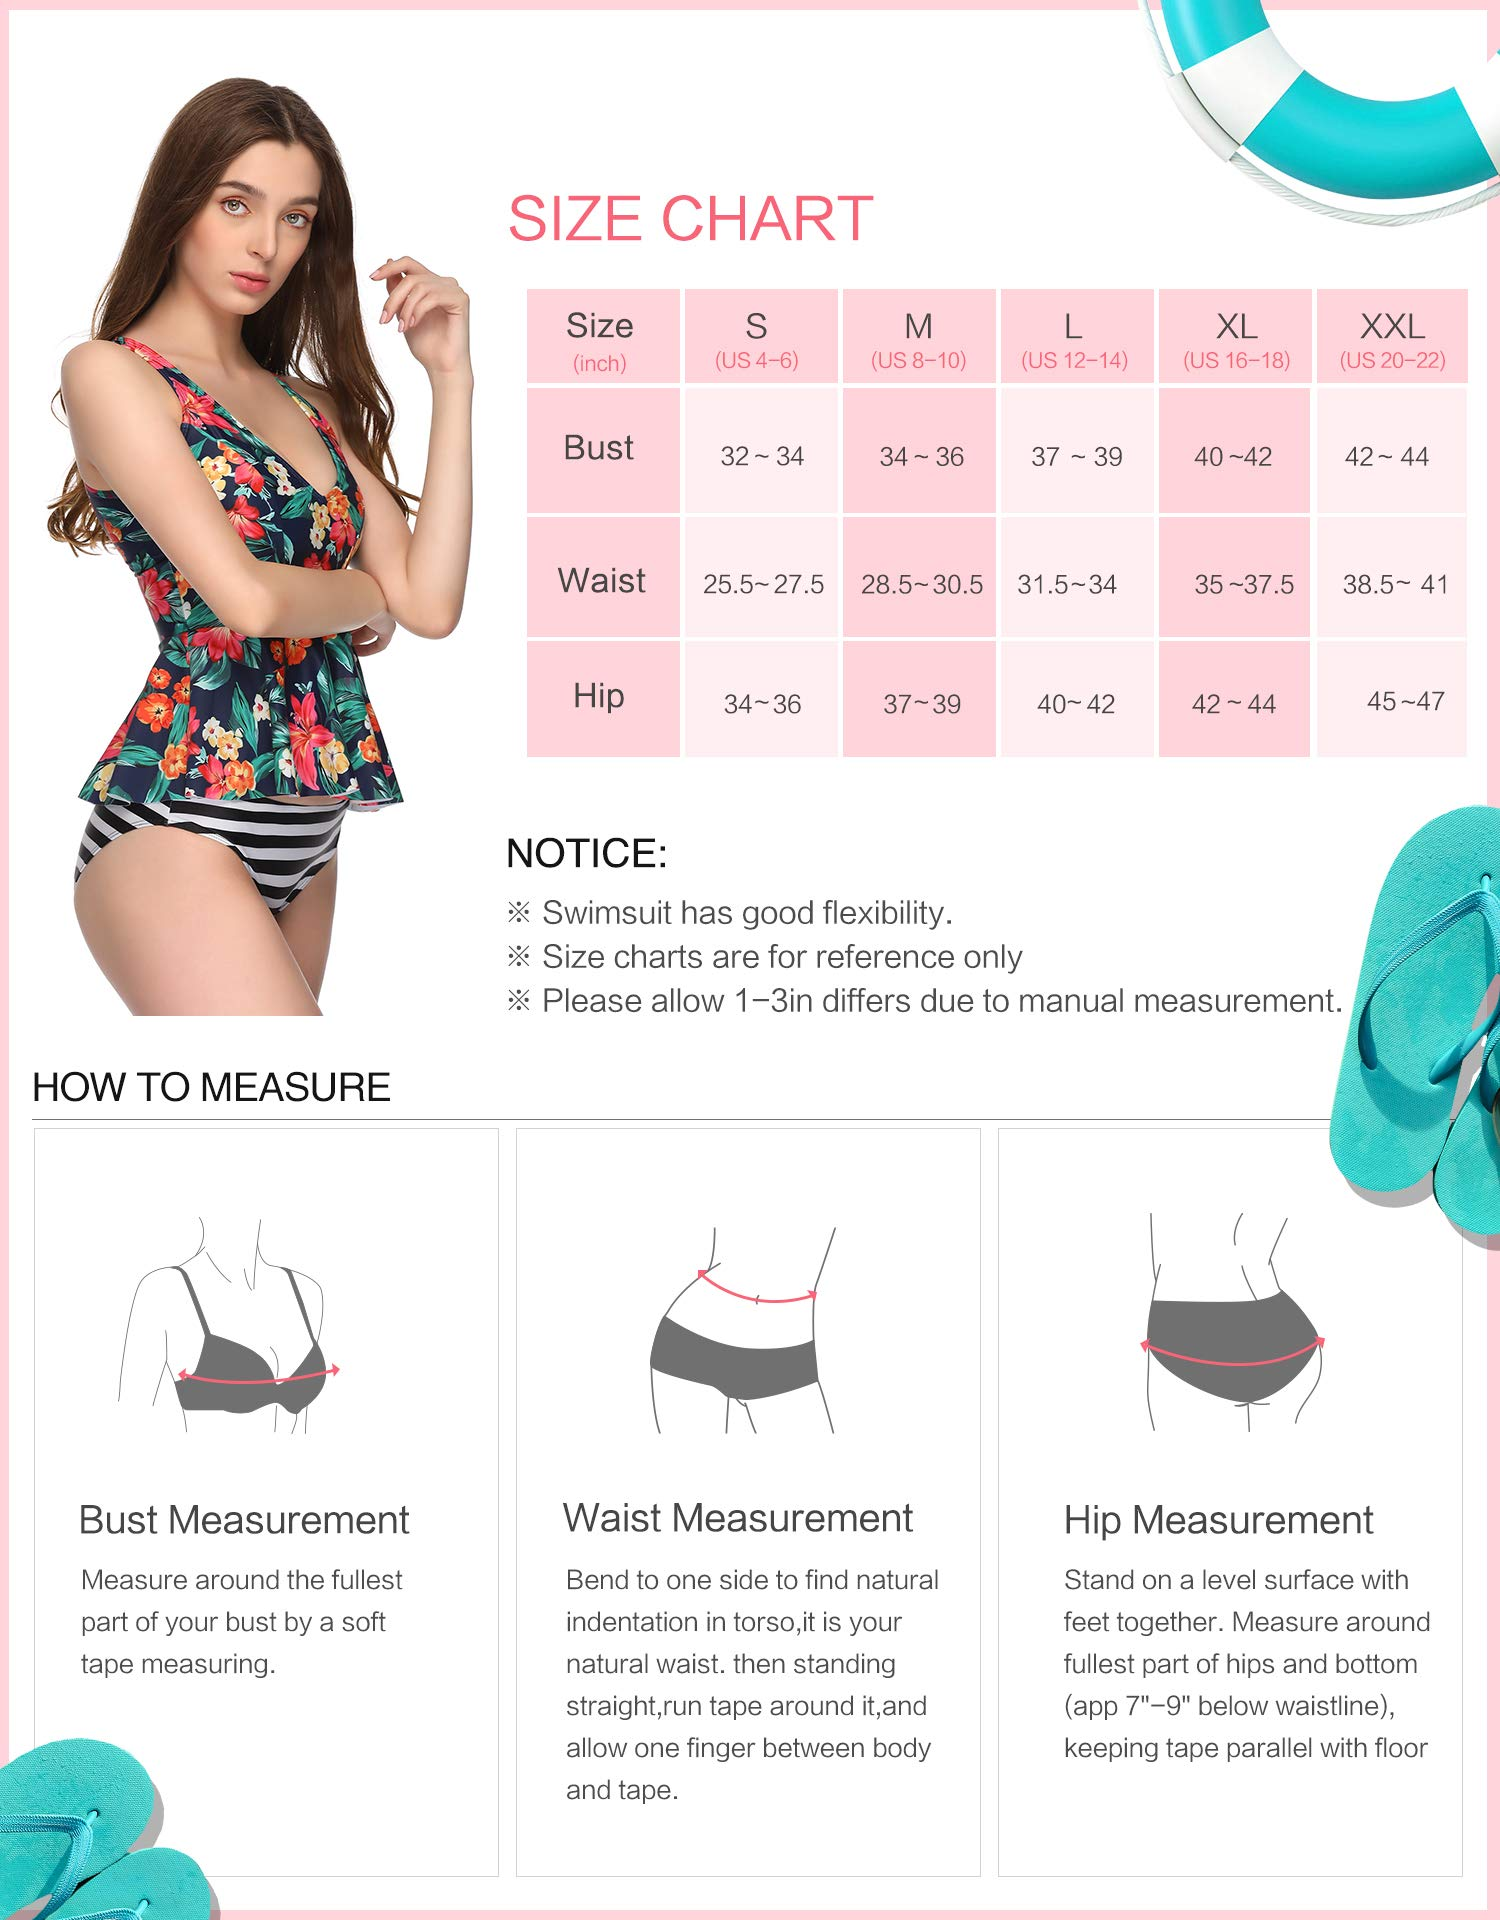 Verano Playa Women Tankini Swimsuit Ruched Ruffle Racerback Two Piece Striped Print Bathing Suit Tummy Control Swimwear